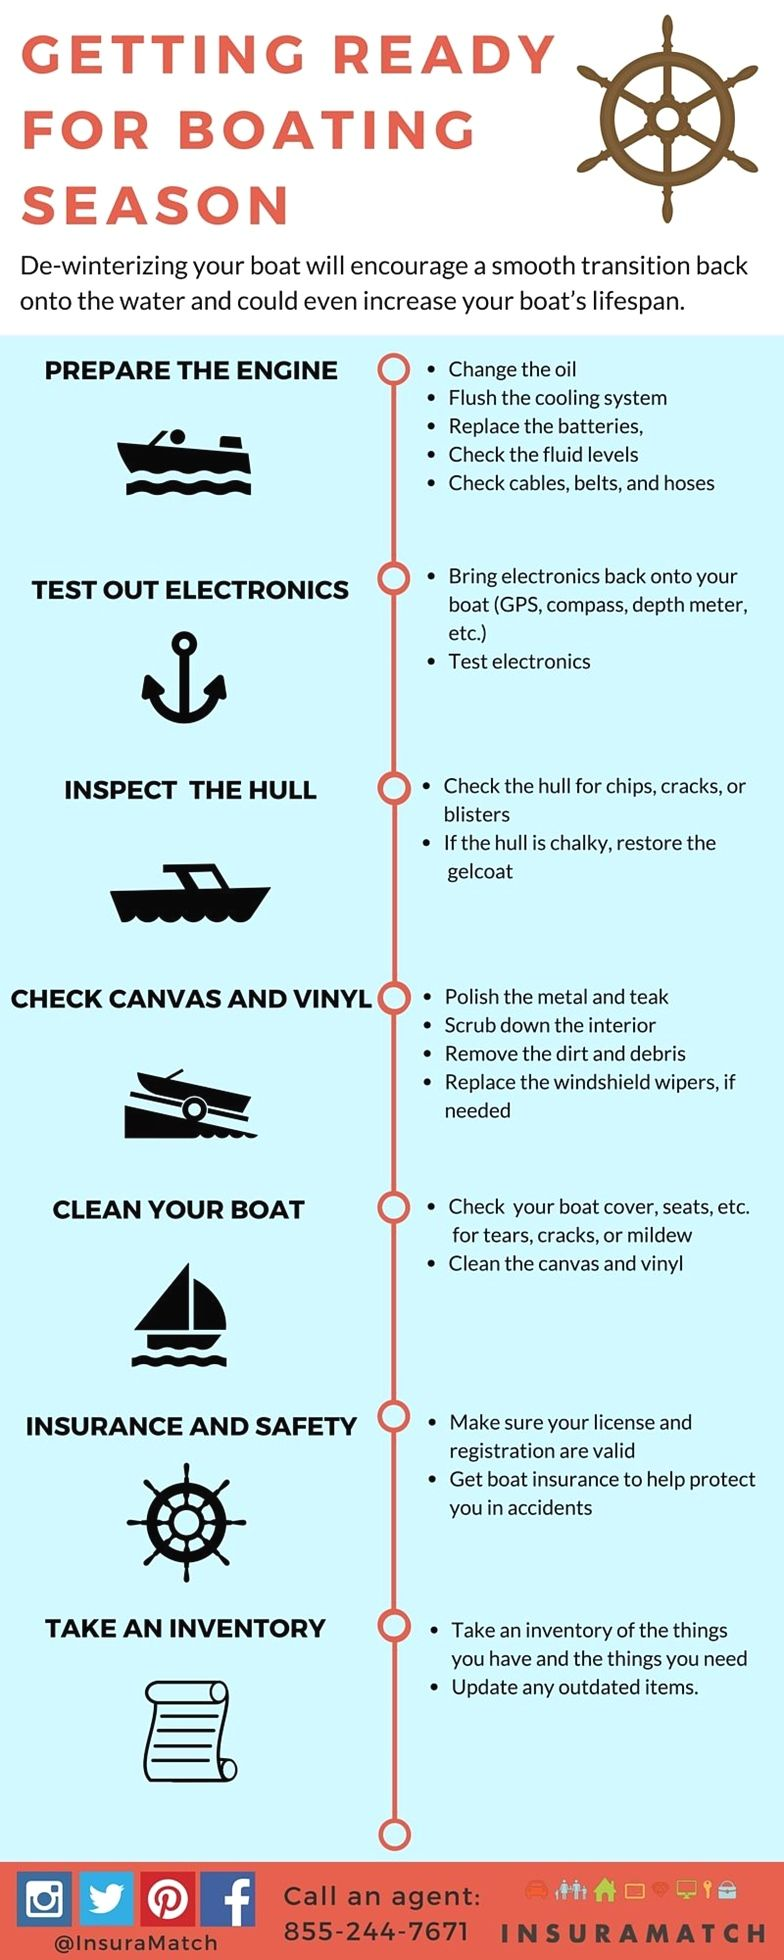 arkansas boats boatingtips Boating tips, Boat safety